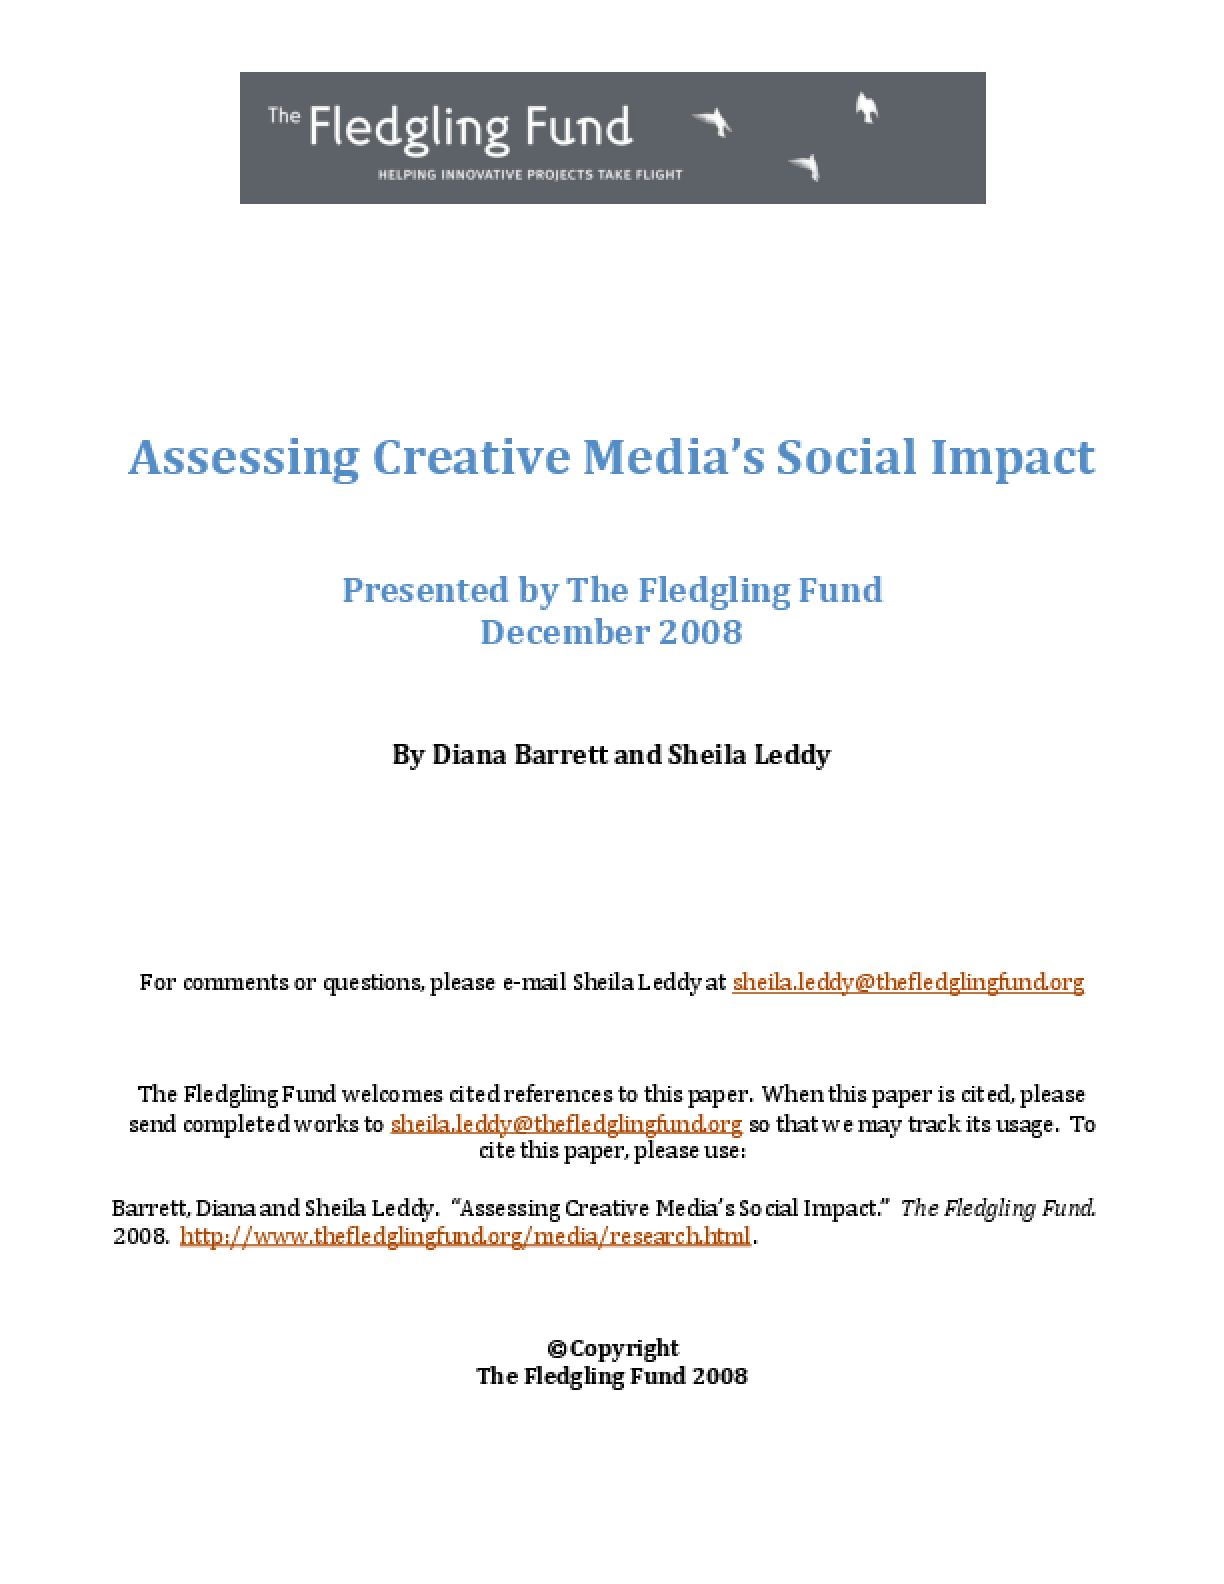 Assessing Creative Media's Social Impact